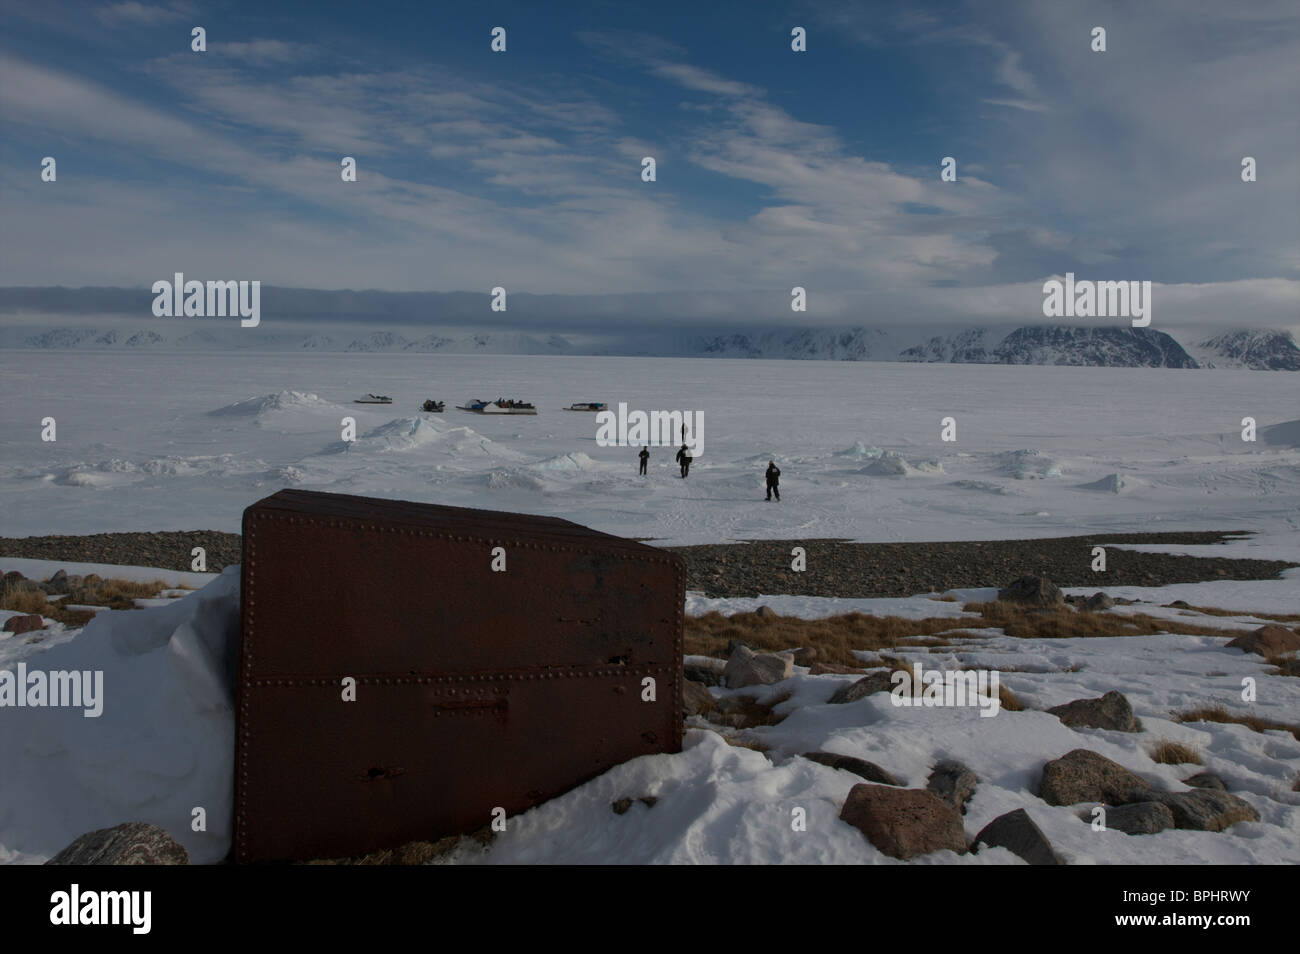 Spring floe edge diving in Lancaster Sound, Pond, Inlet, Baffin Island, Nunavut, Canada - Stock Image